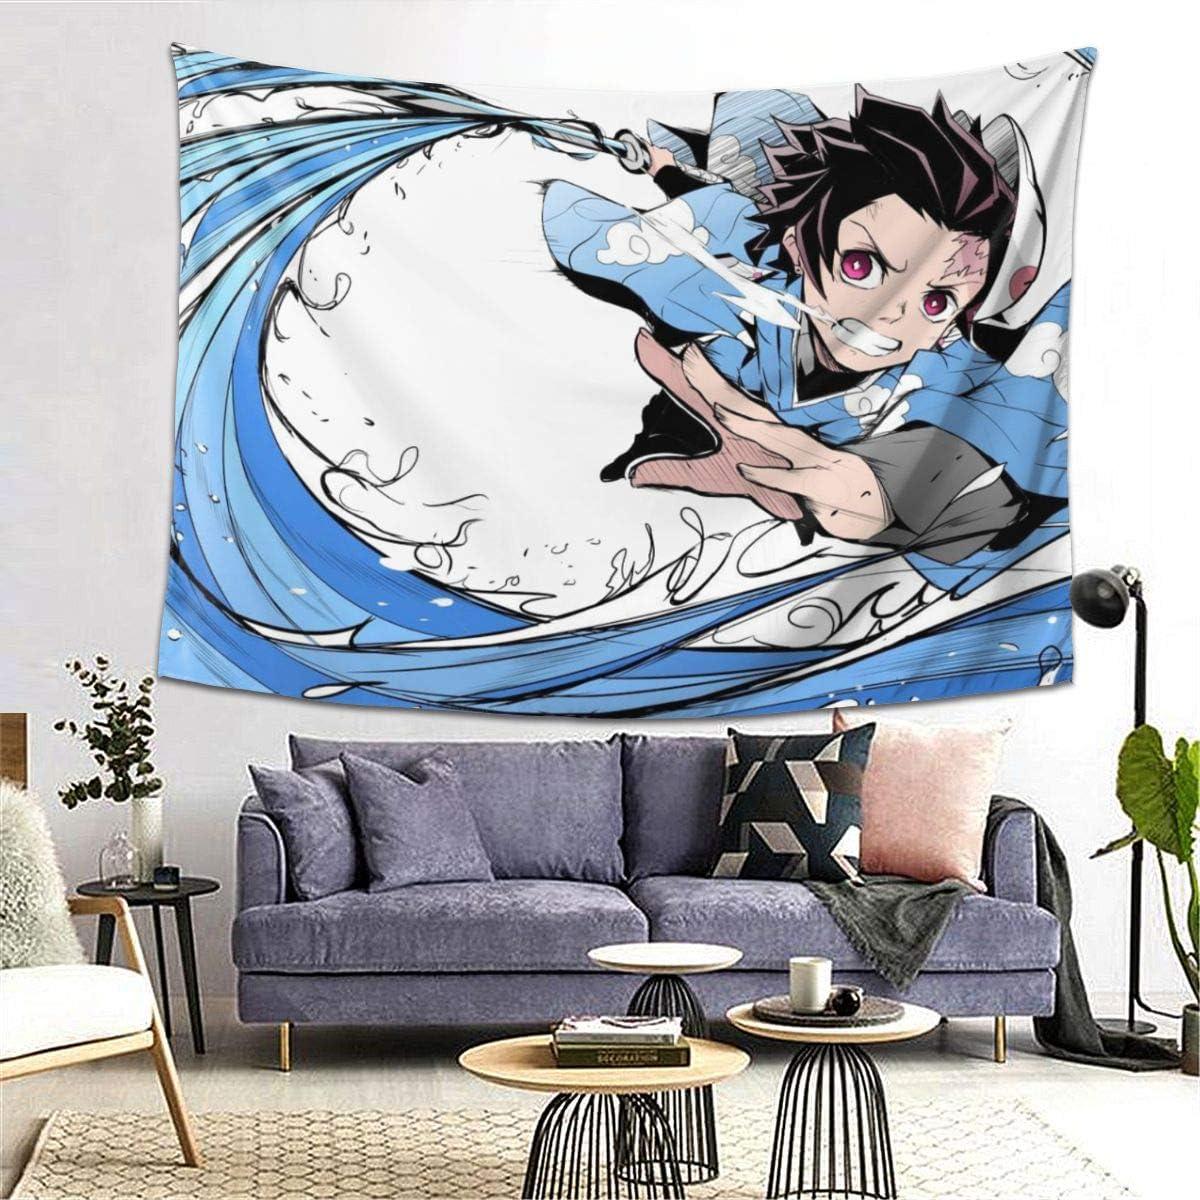 Yagi Mika Tanjiro Kimetsu-No-Yaiba Tapestry Wall Art Hanging Home Decor Blanket 80×60 in